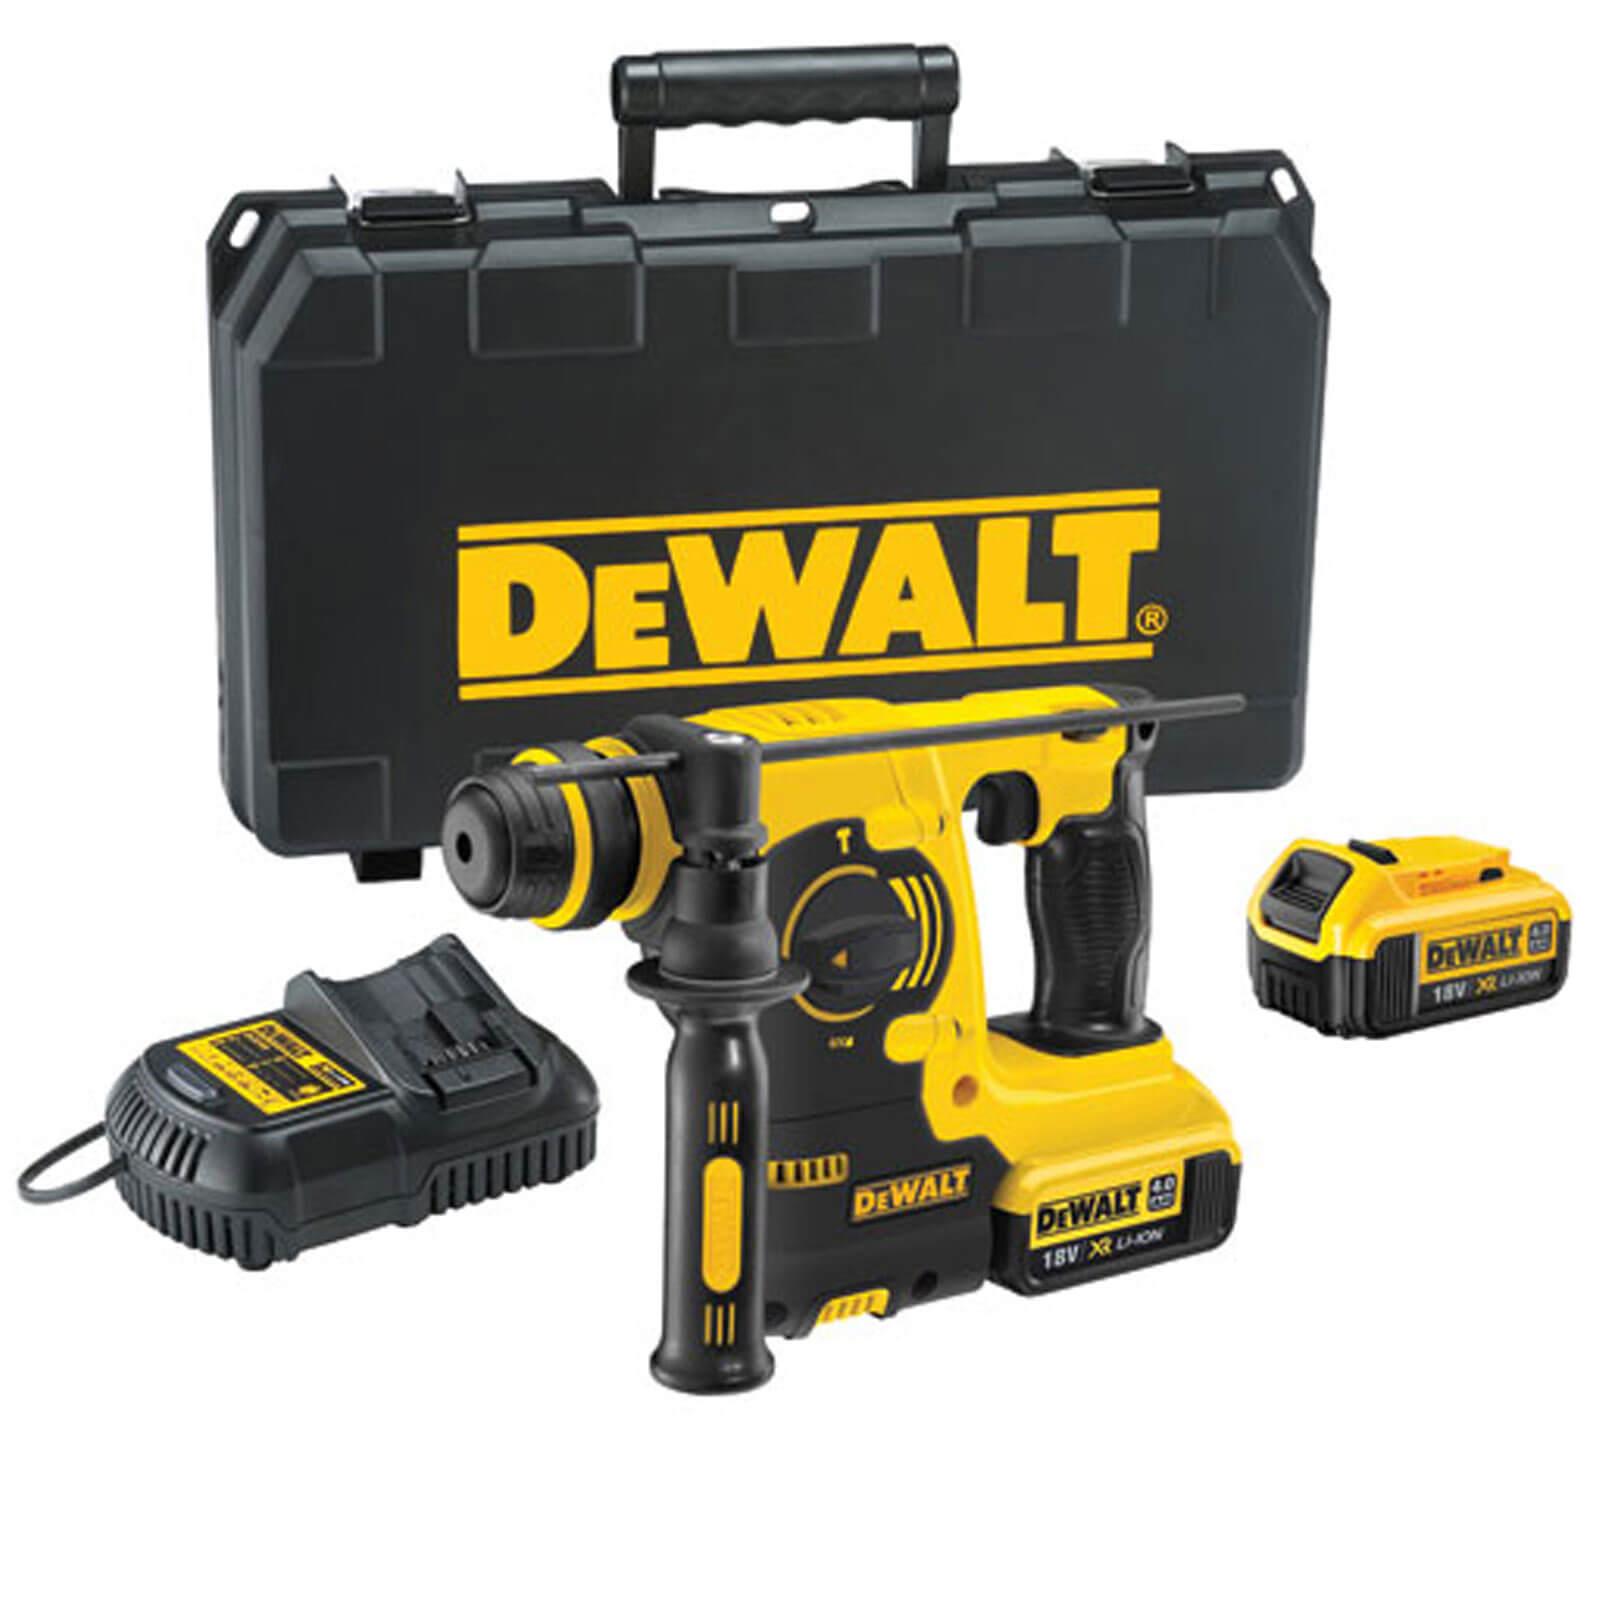 DeWalt DCH253 18v XR Cordless SDS Plus Hammer Drill 2 x 4ah Liion Charger Case